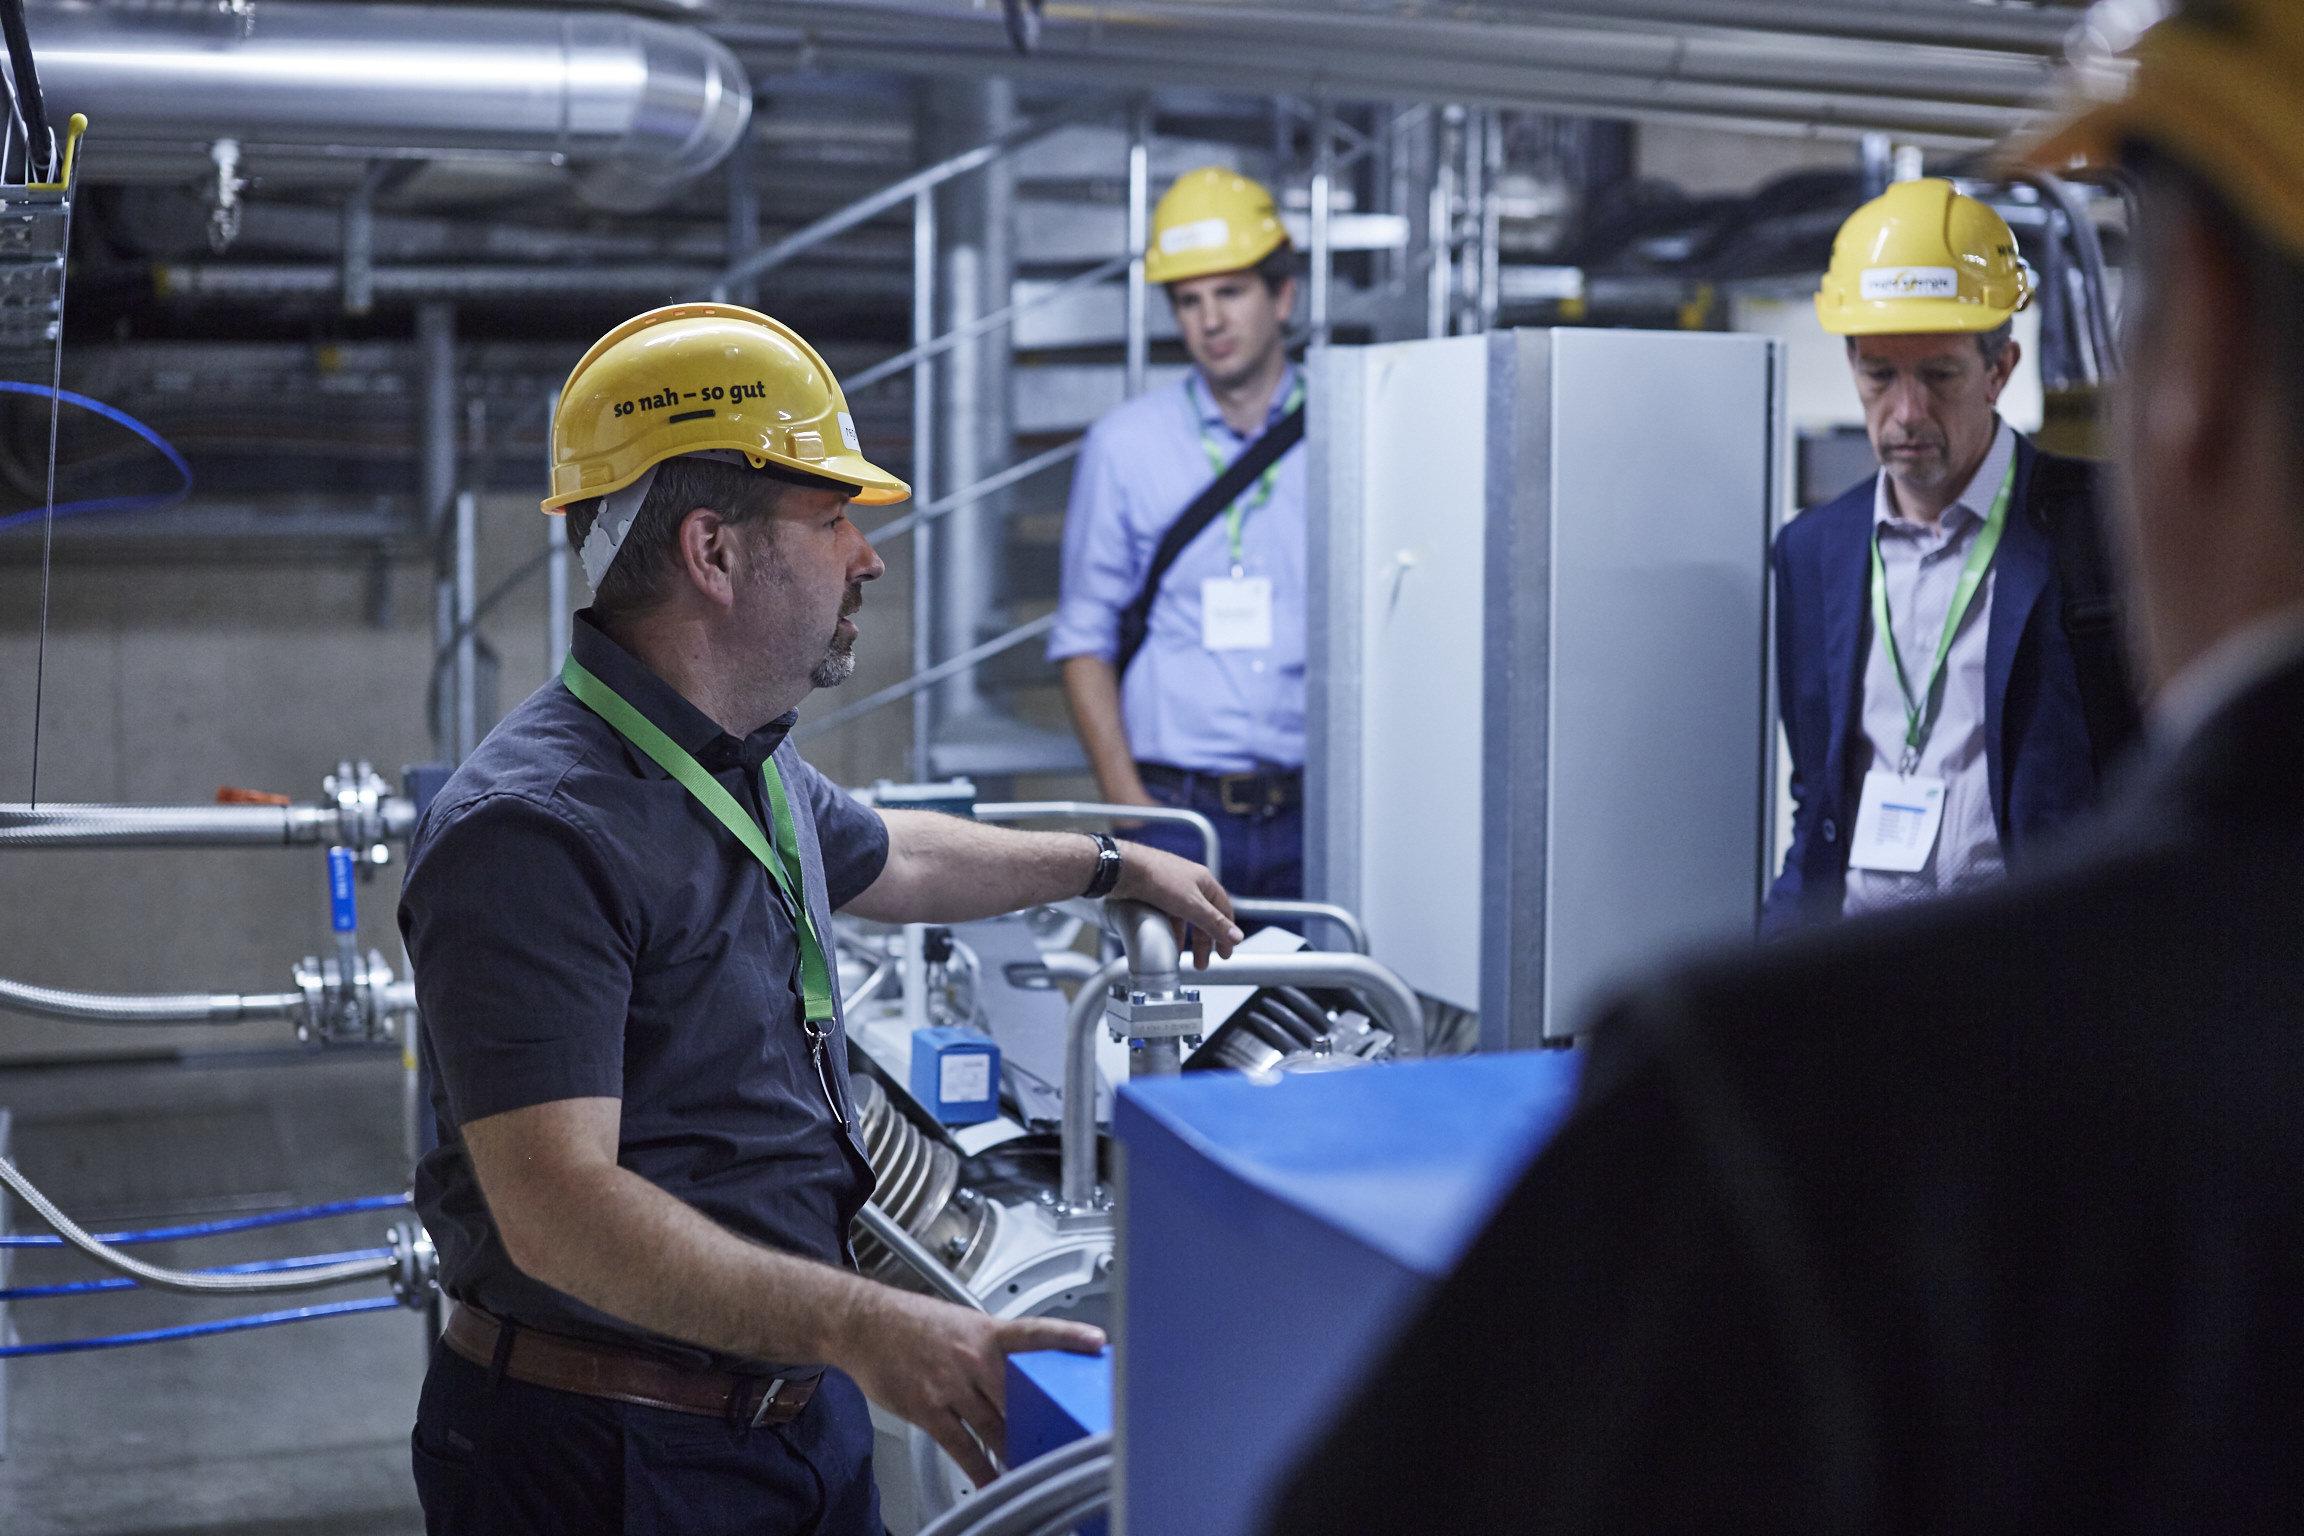 Wissen: Energiezukunft - Gasindustrie fördert neue Technologien